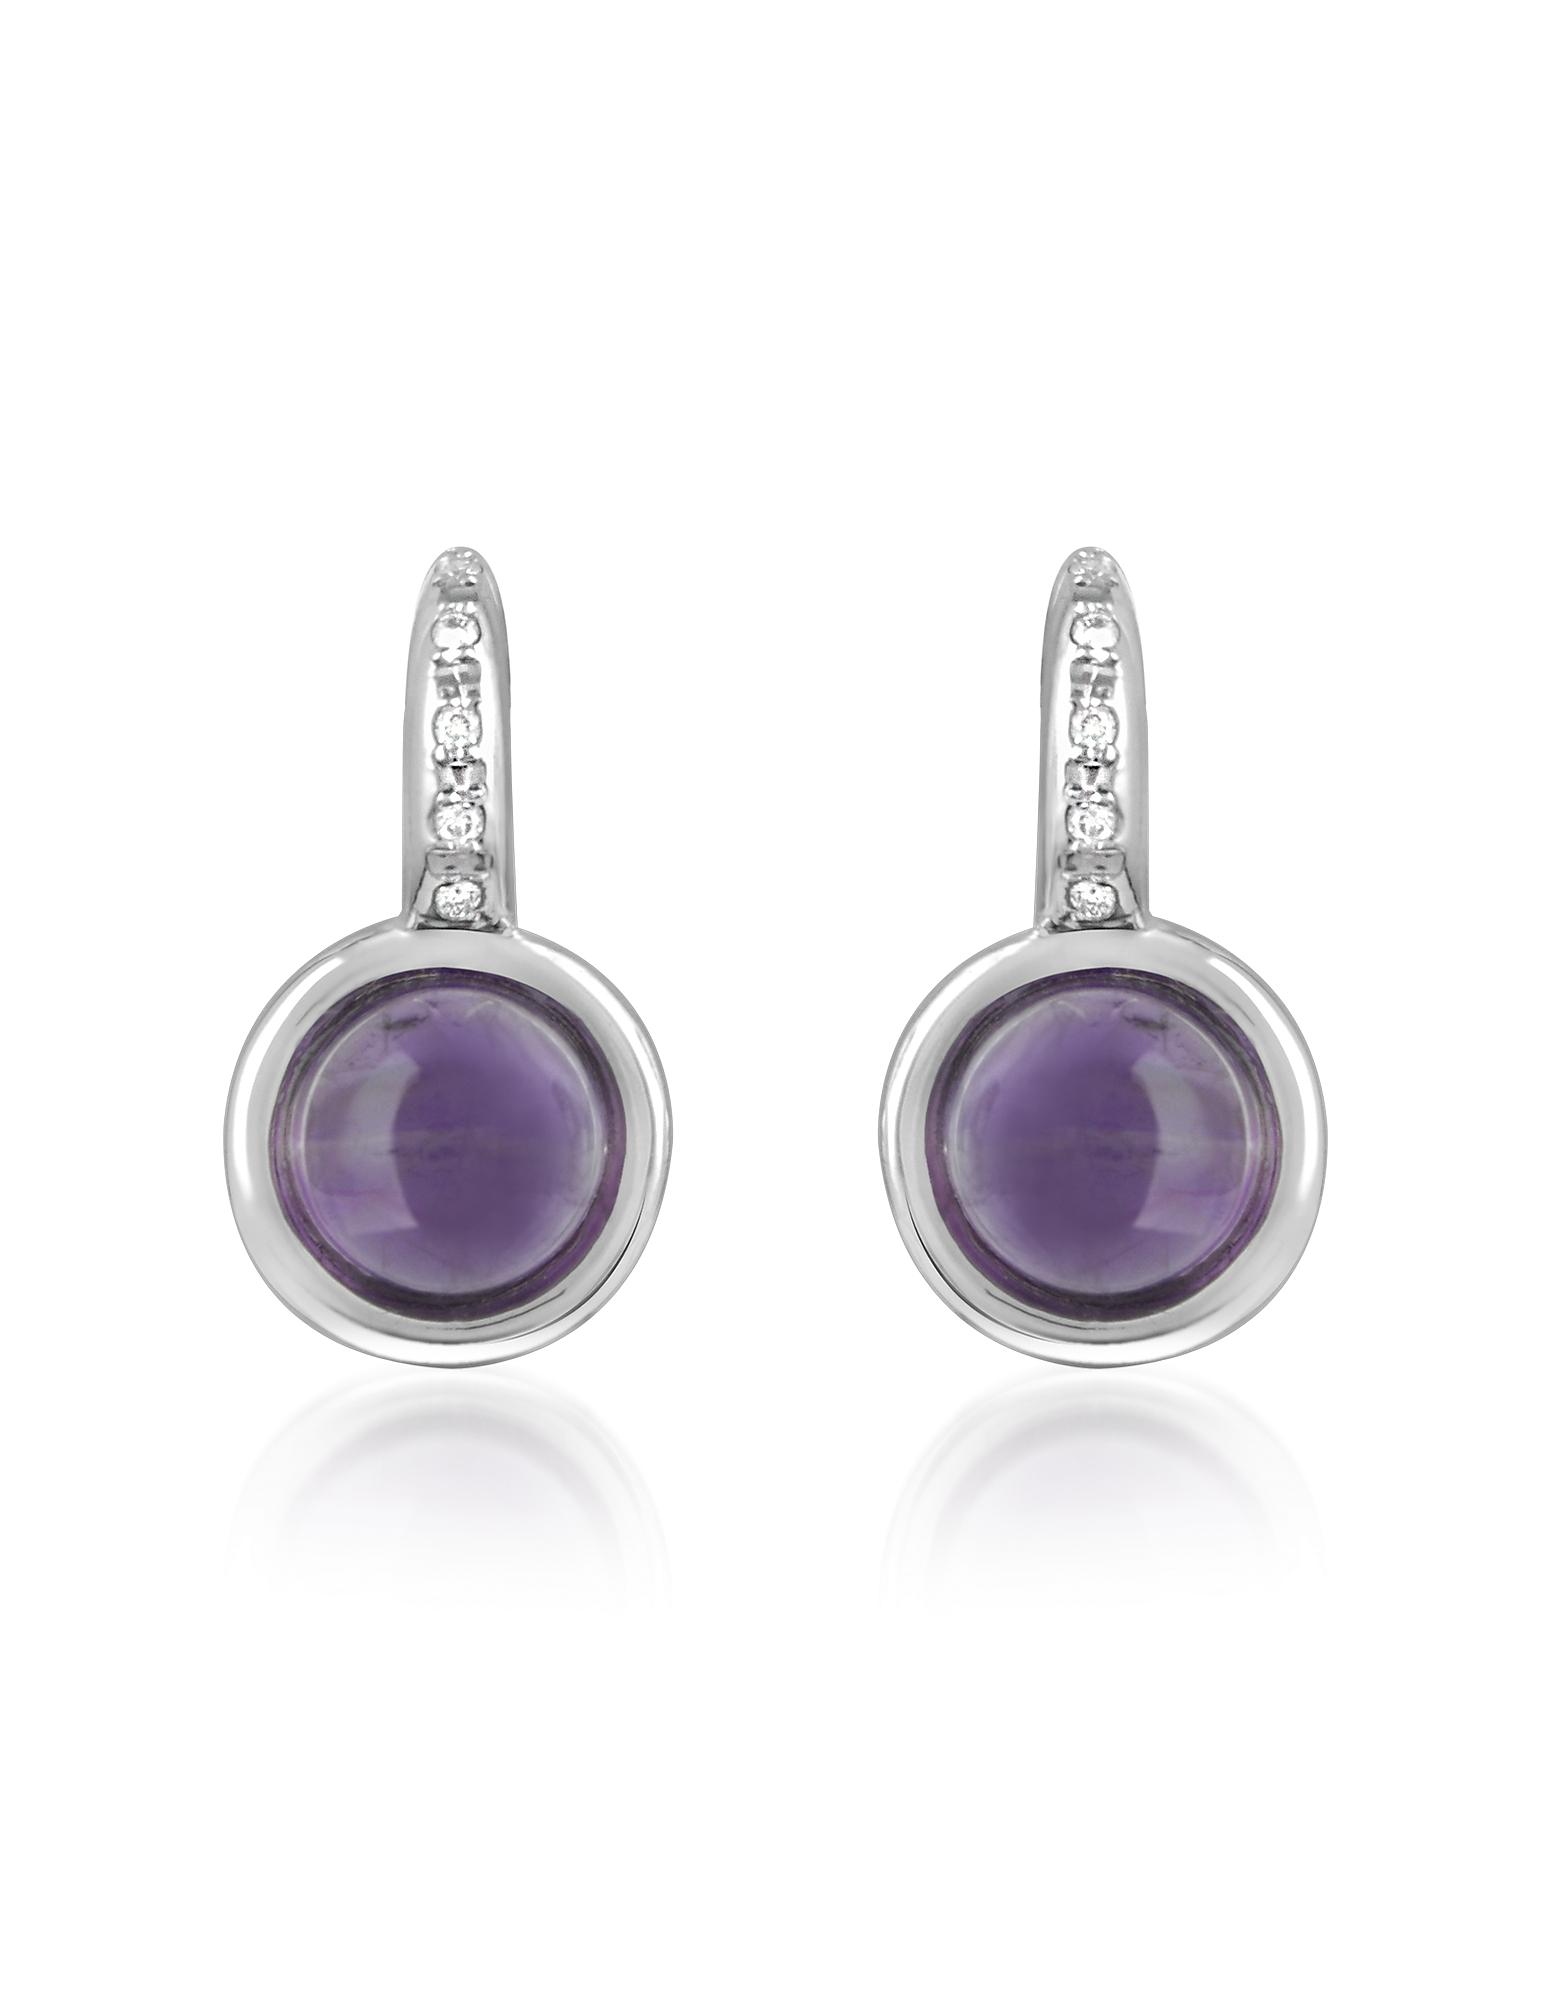 Mia & Beverly Earrings, Amethyst and Diamond 18K White Gold Earrings